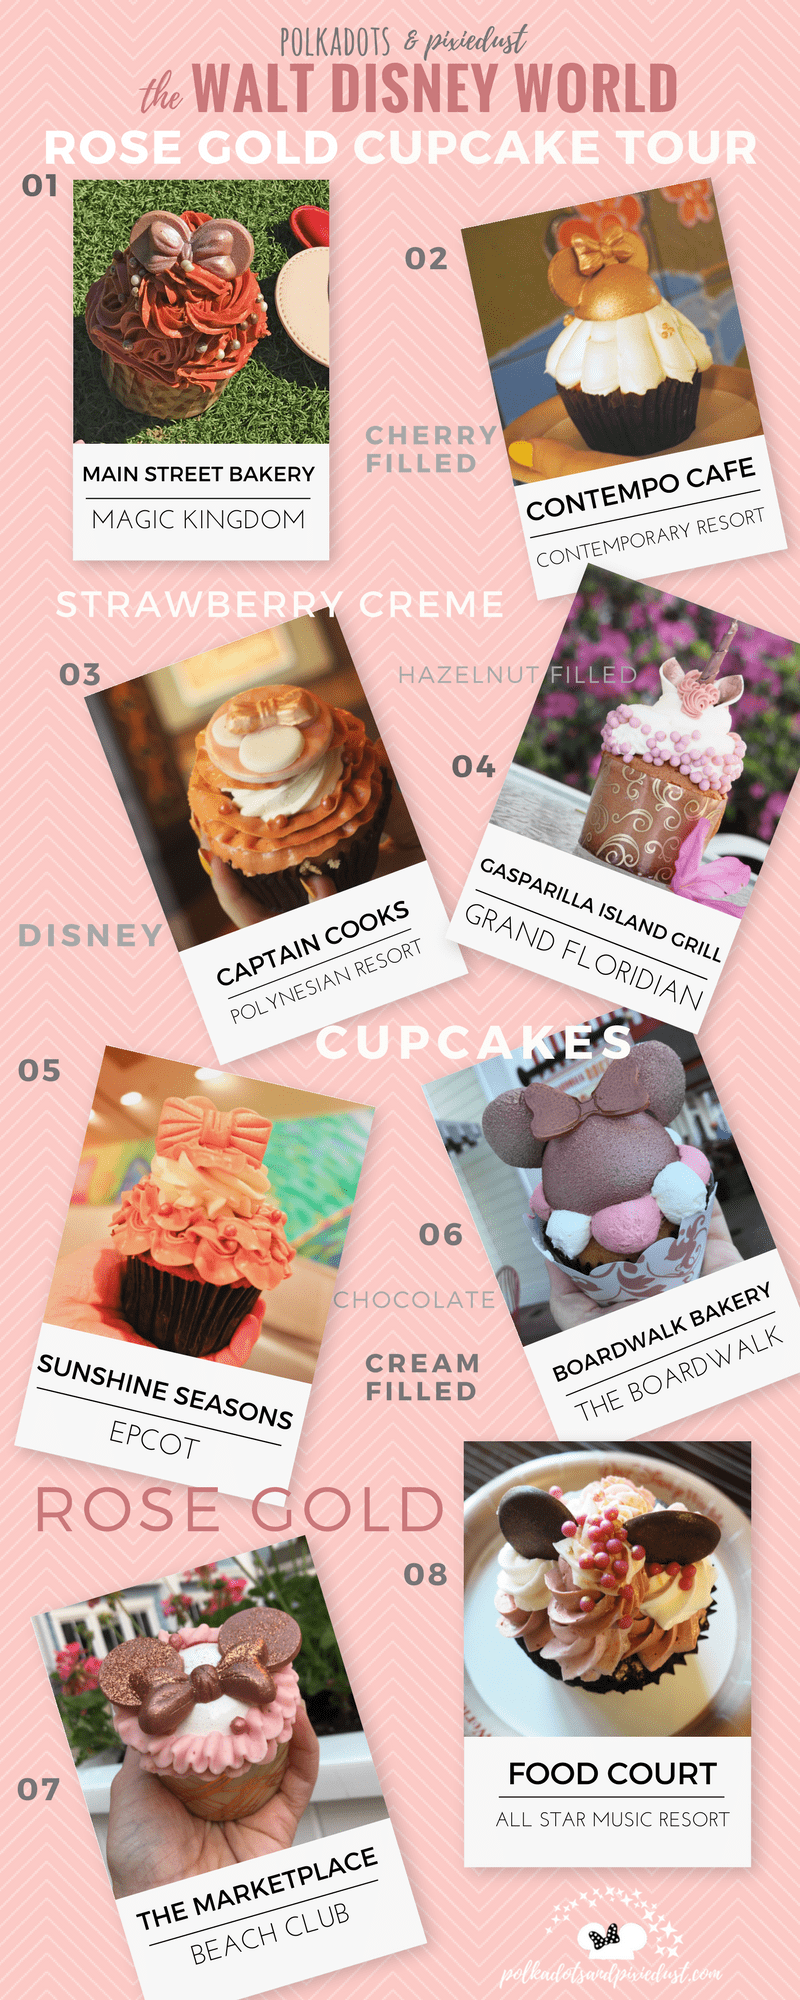 polkadotsandpixiedust.com rose gold cupcakes at disney